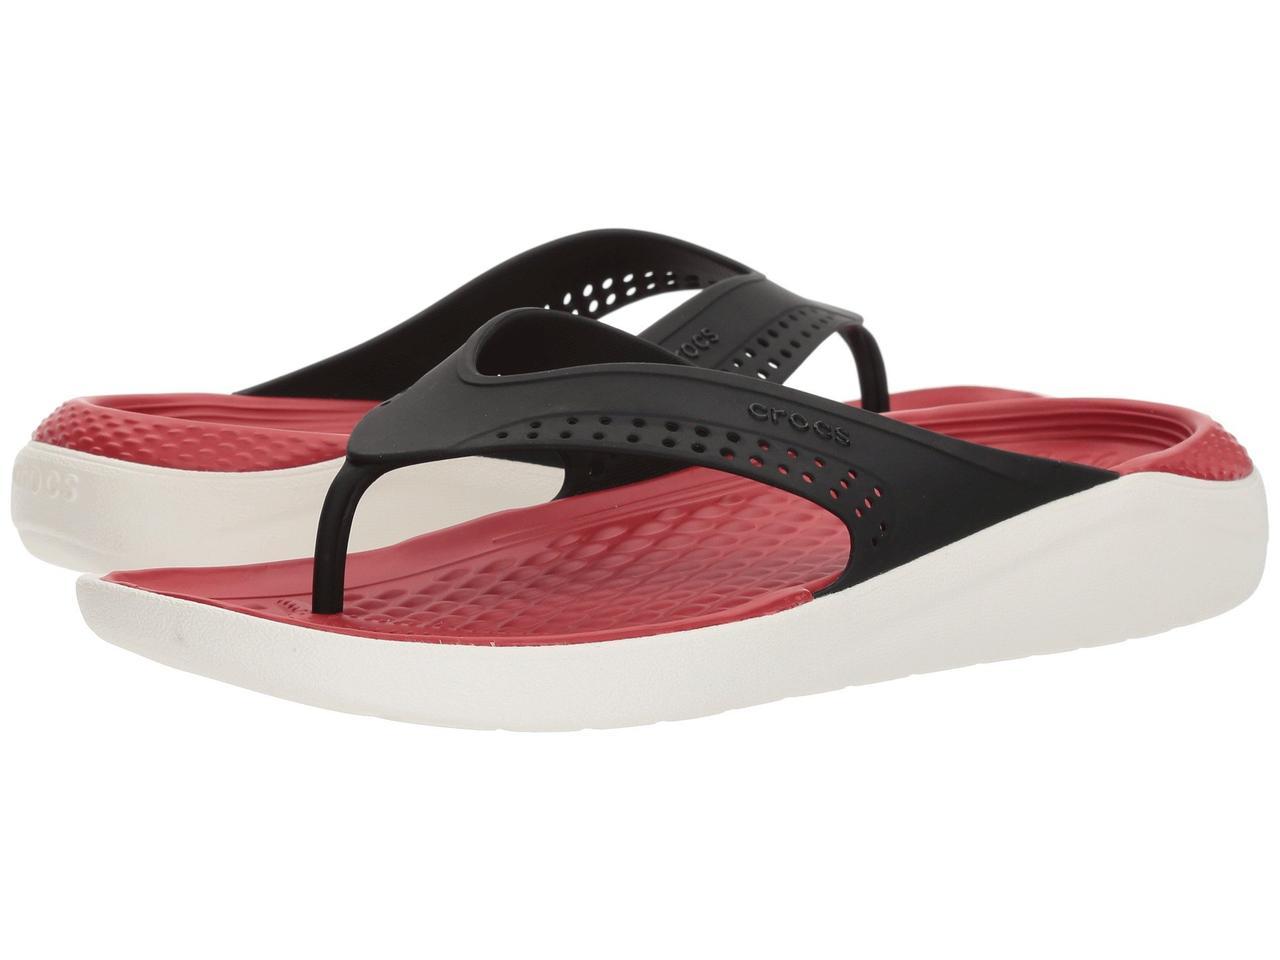 Вьетнамки мужские Crocs LiteRide М11 М12 М13 EUR 45 46 47 48 49 сланцы оригинал Крокс США шлёпанцы с массажем